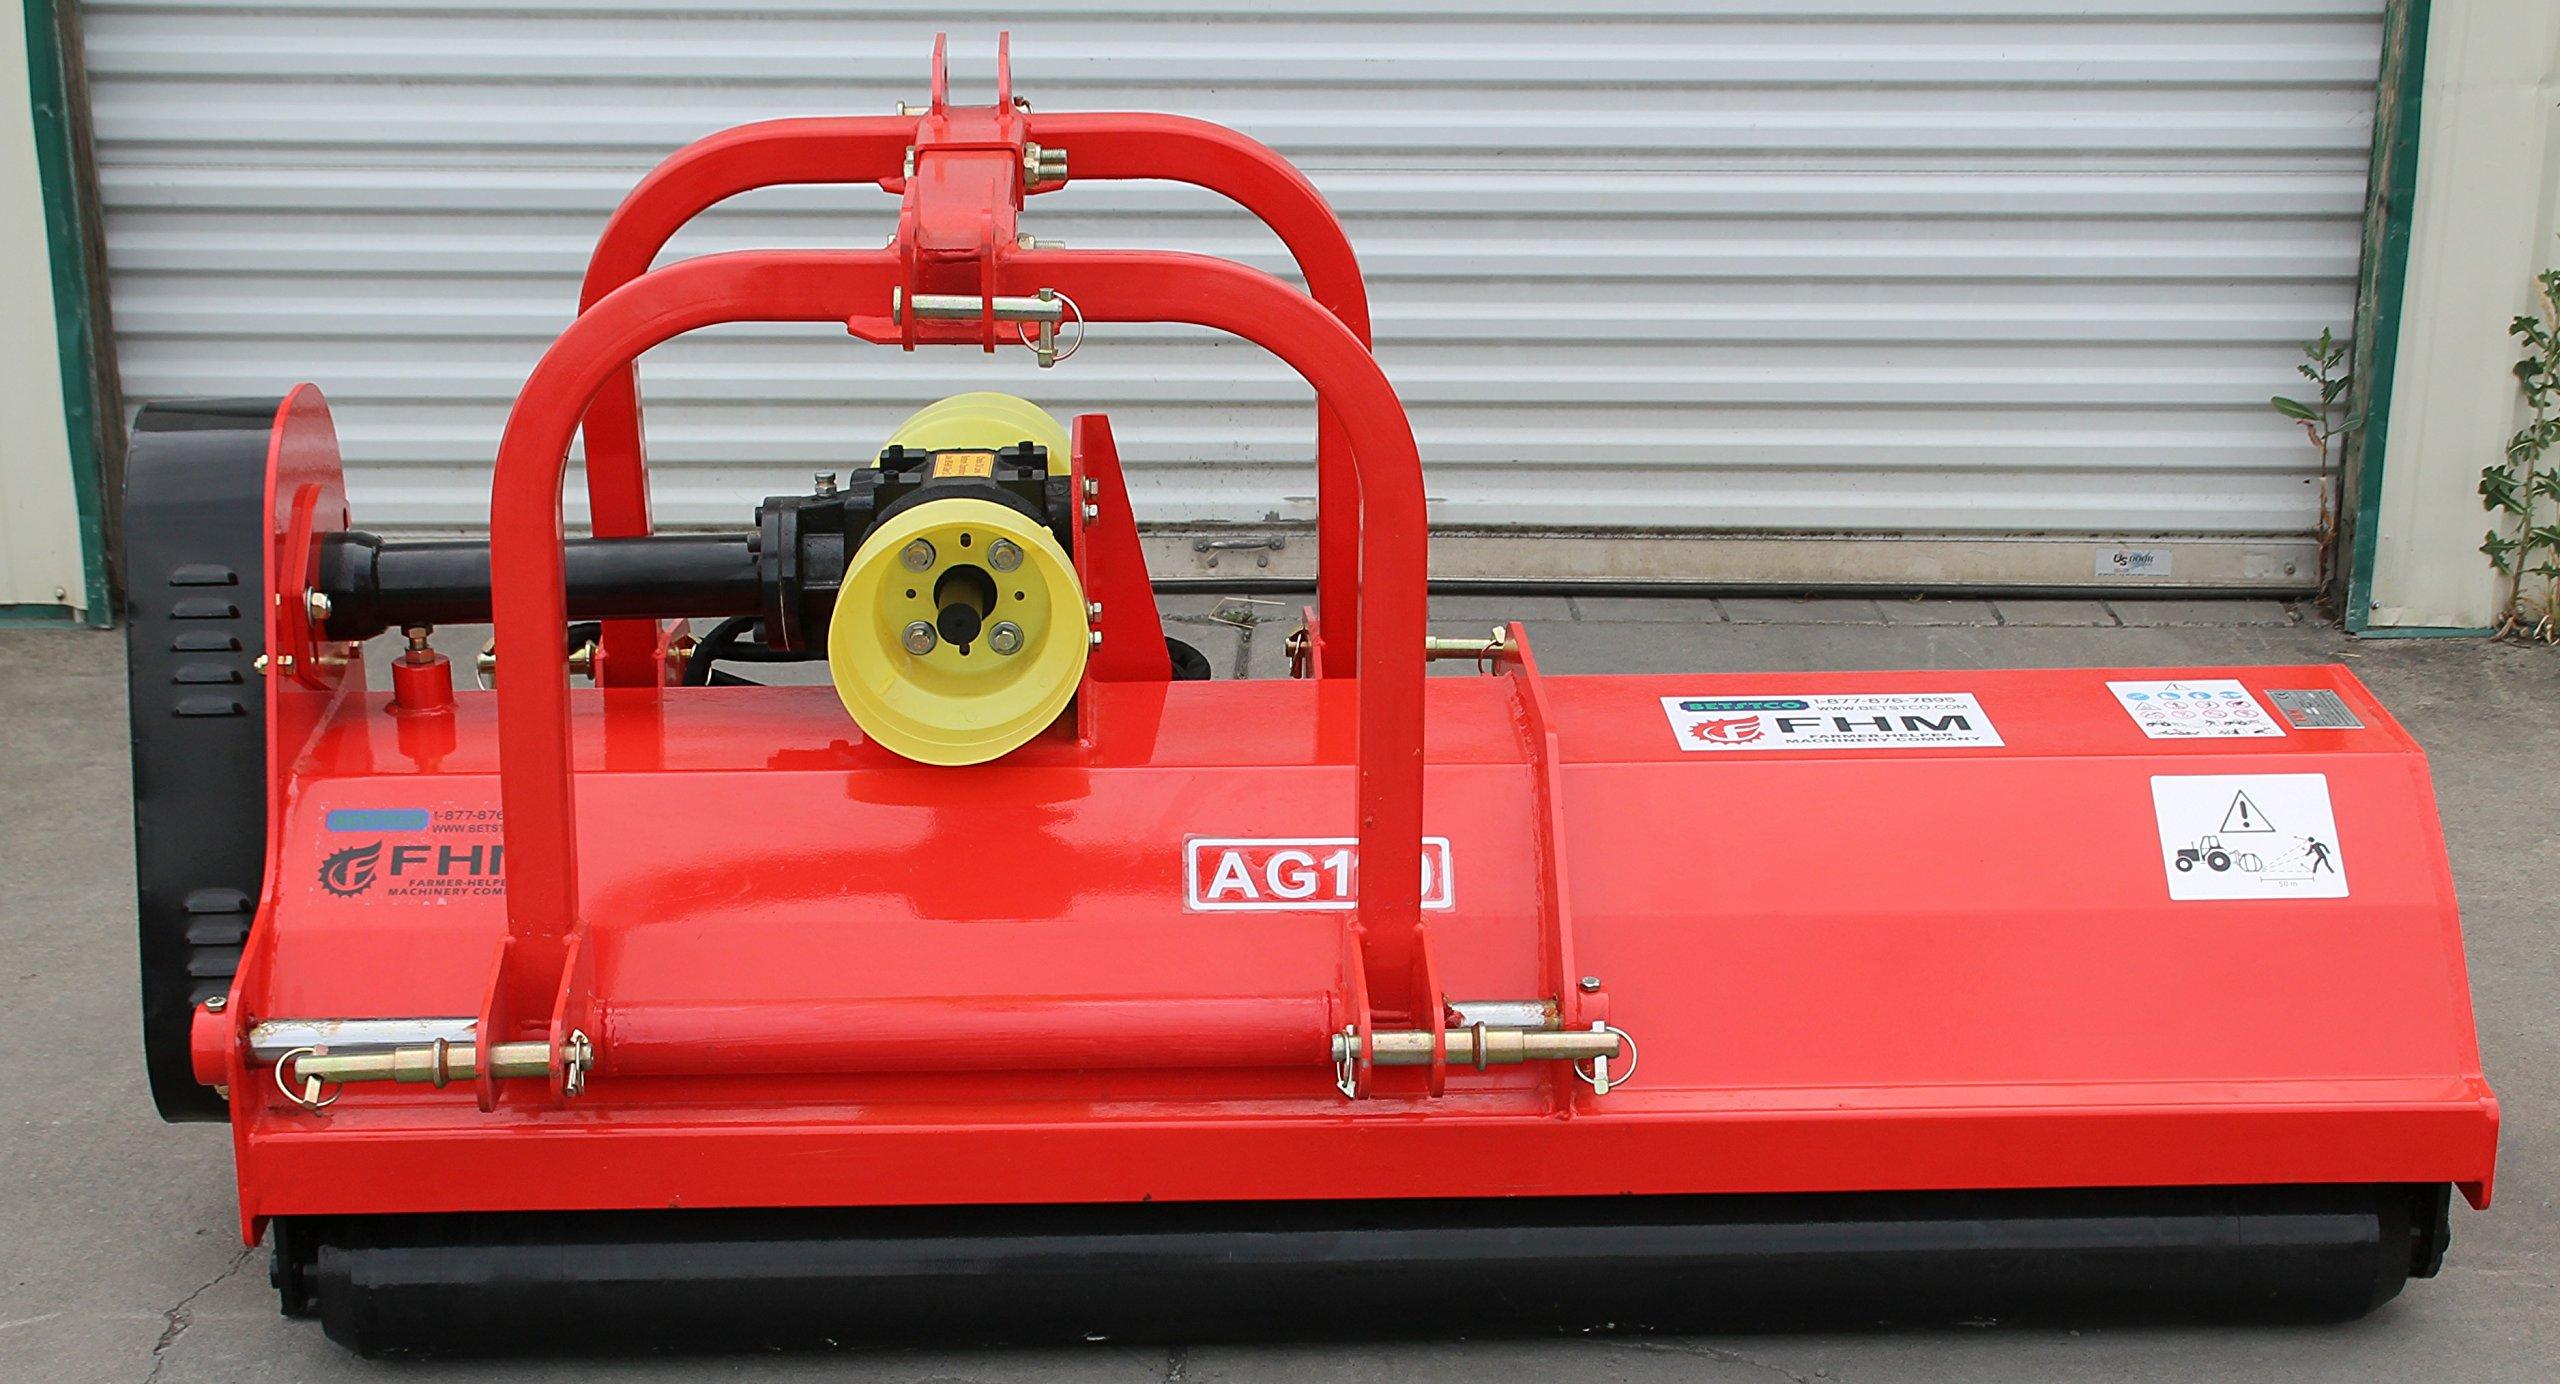 Farmer Helper 71'' Flail Mower/Mulcher w/Hydraulic Offset ~Cat.I/II 3pt 40+HP Rating (FH-AG180)